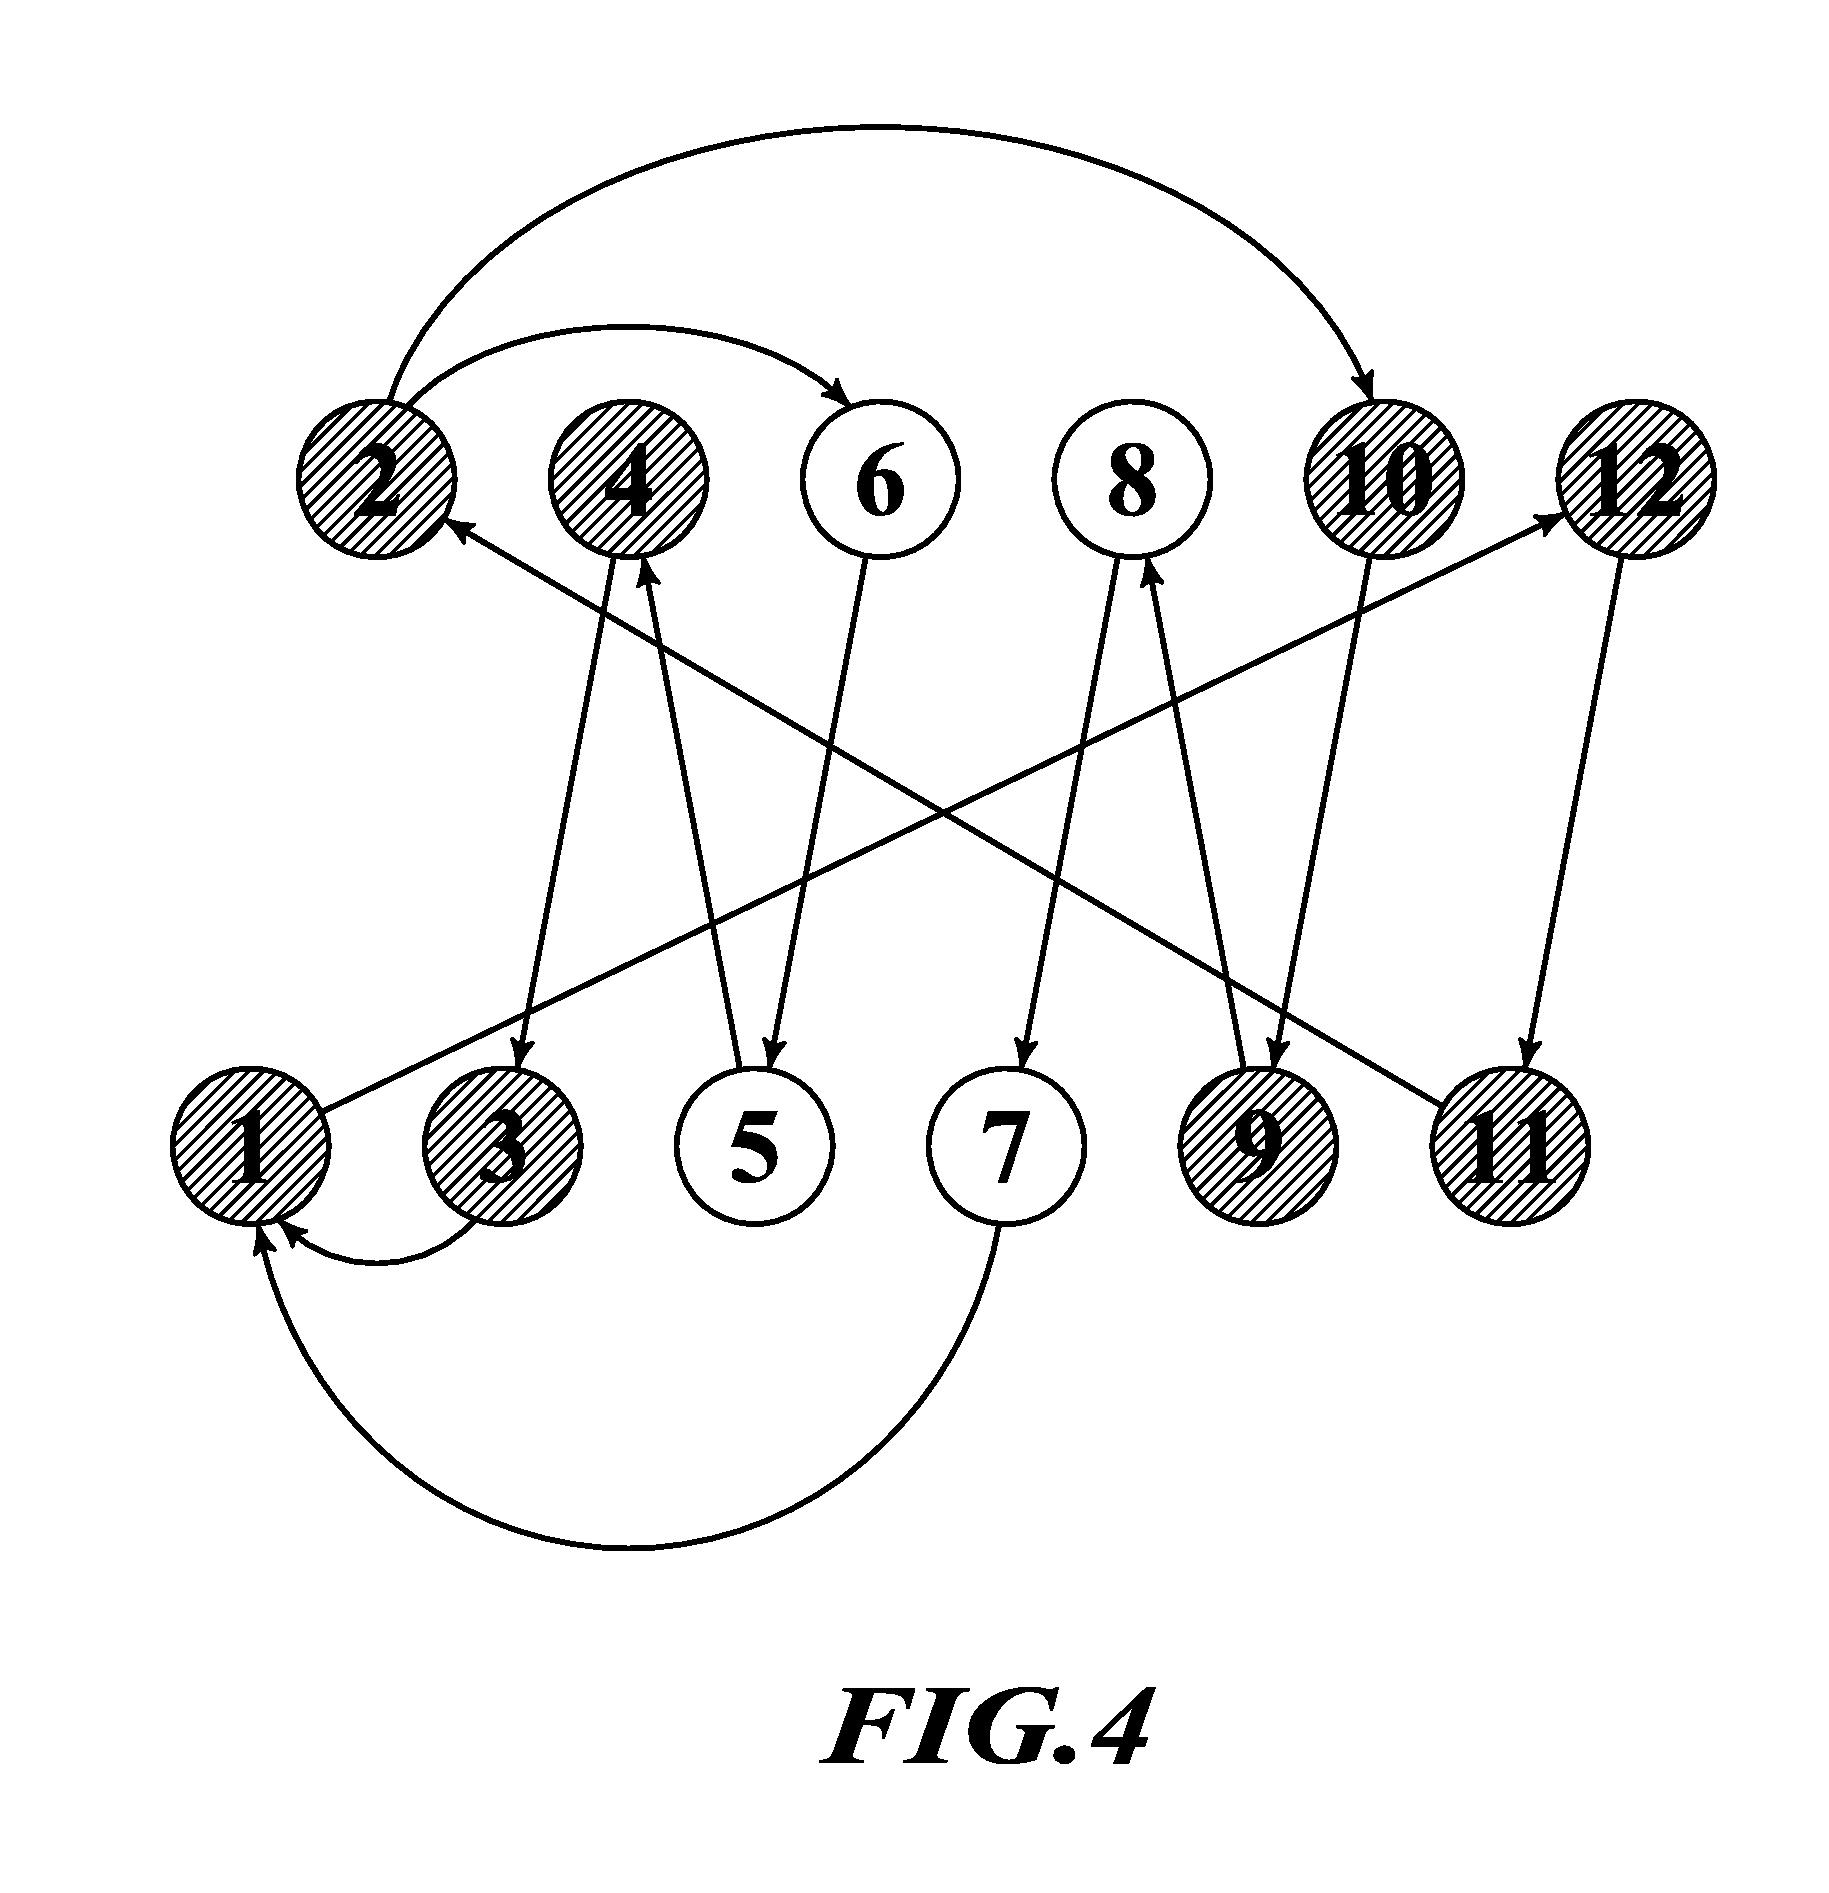 4 cylinder firing order diagram origami flower engine block drawing free image